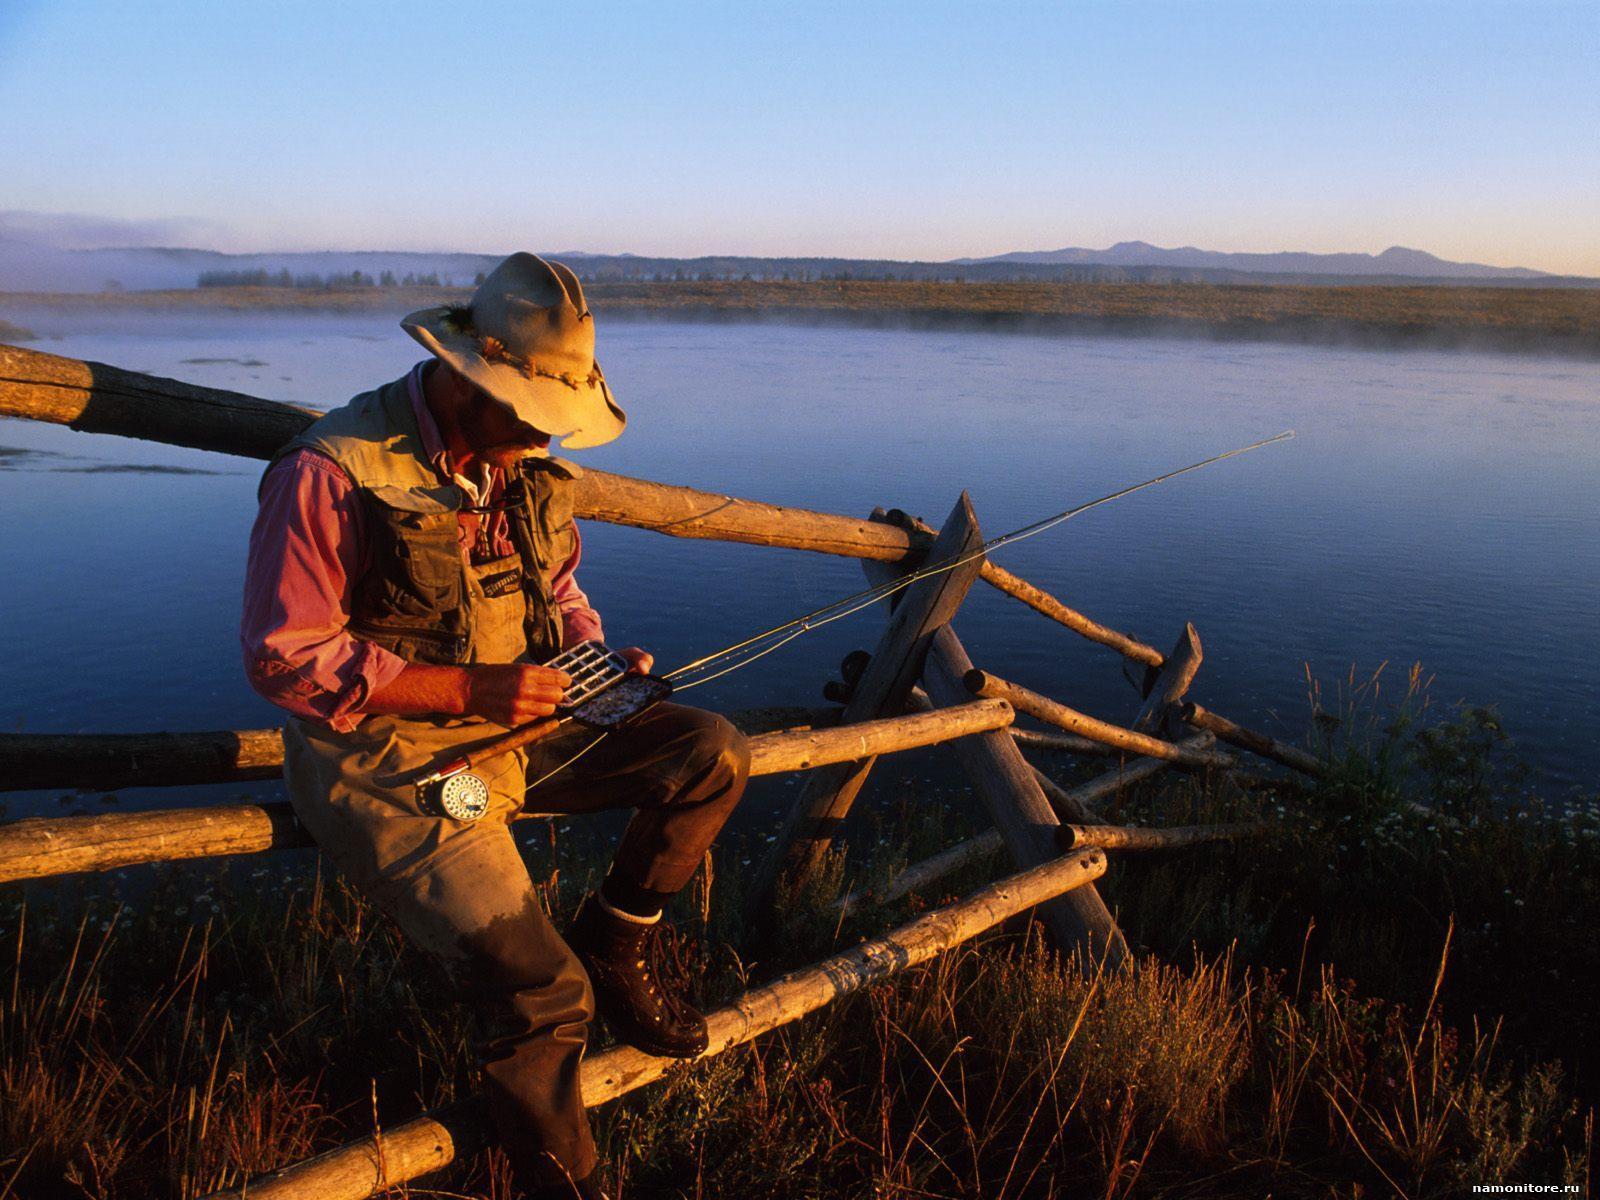 Рыболов со спиннингом на берегу реки